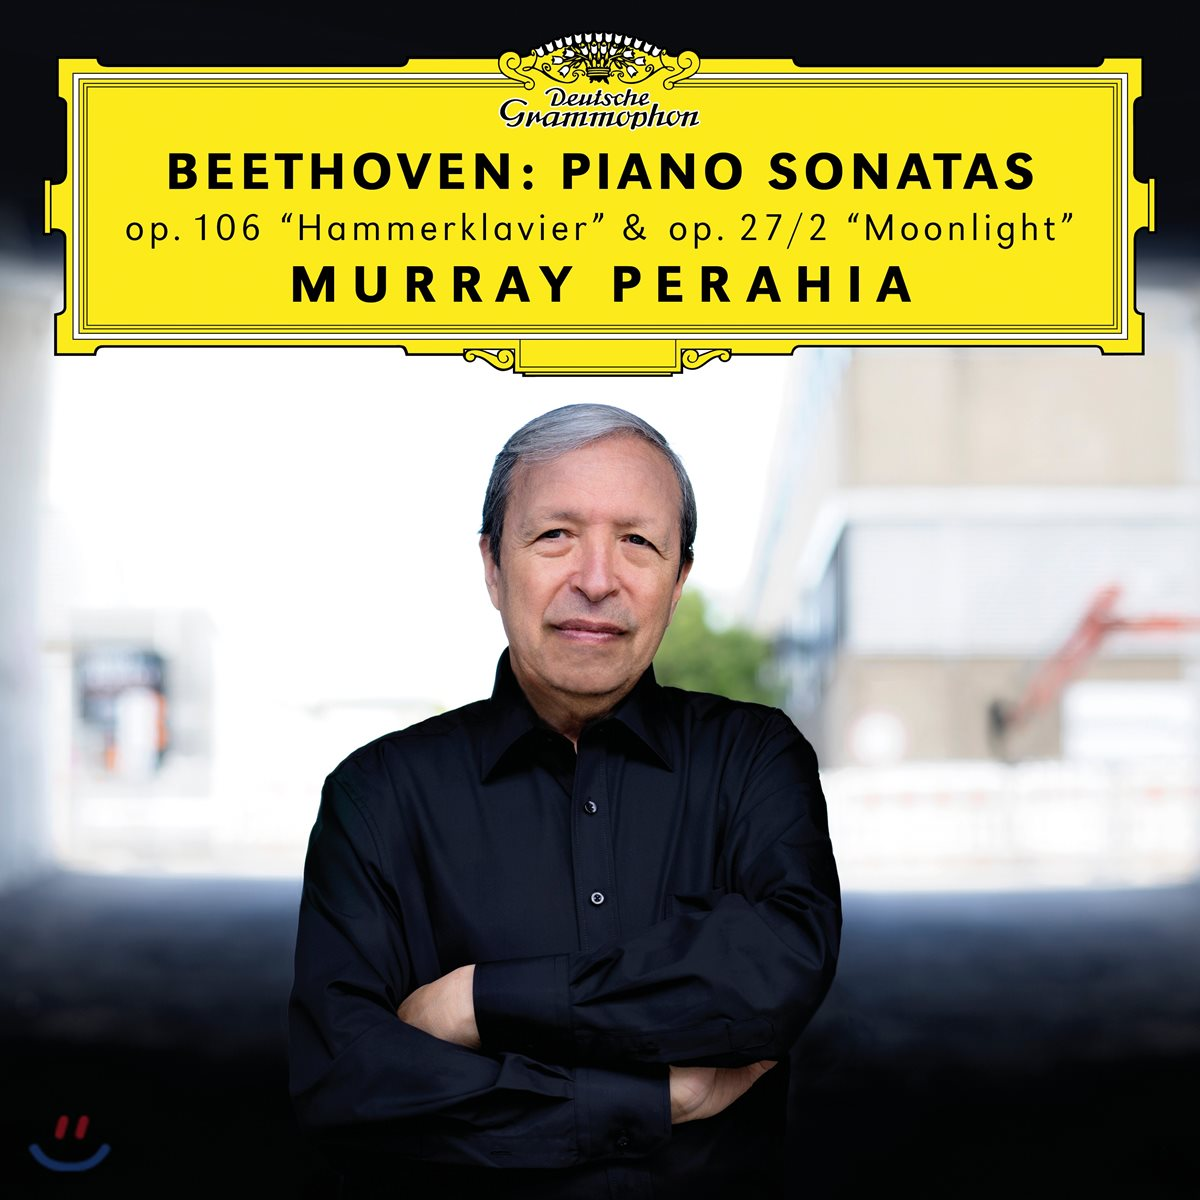 Murray Perahia 베토벤: 피아노 소나타 29번 '함머클라비어', 14번 '월광' - 머레이 페라이어